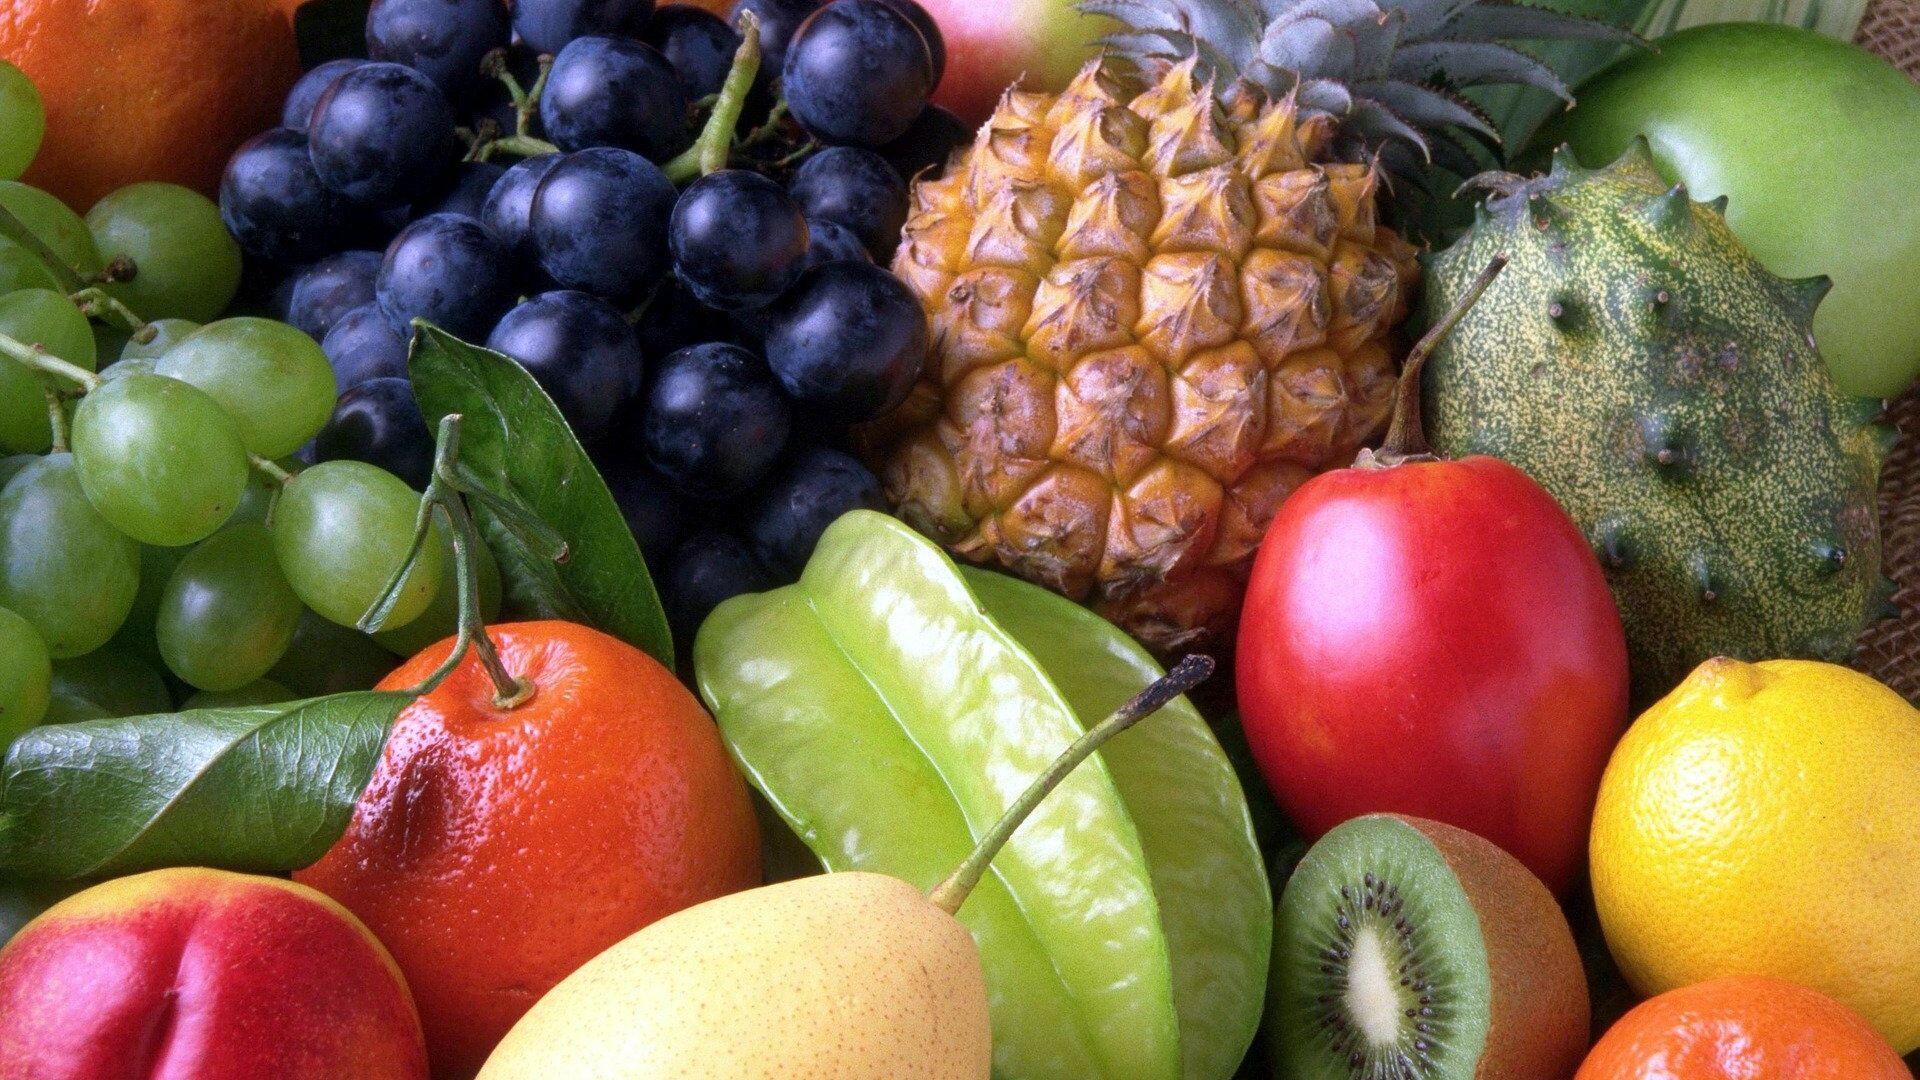 Frutas tropicales (imagen referencial) - Sputnik Mundo, 1920, 07.09.2021